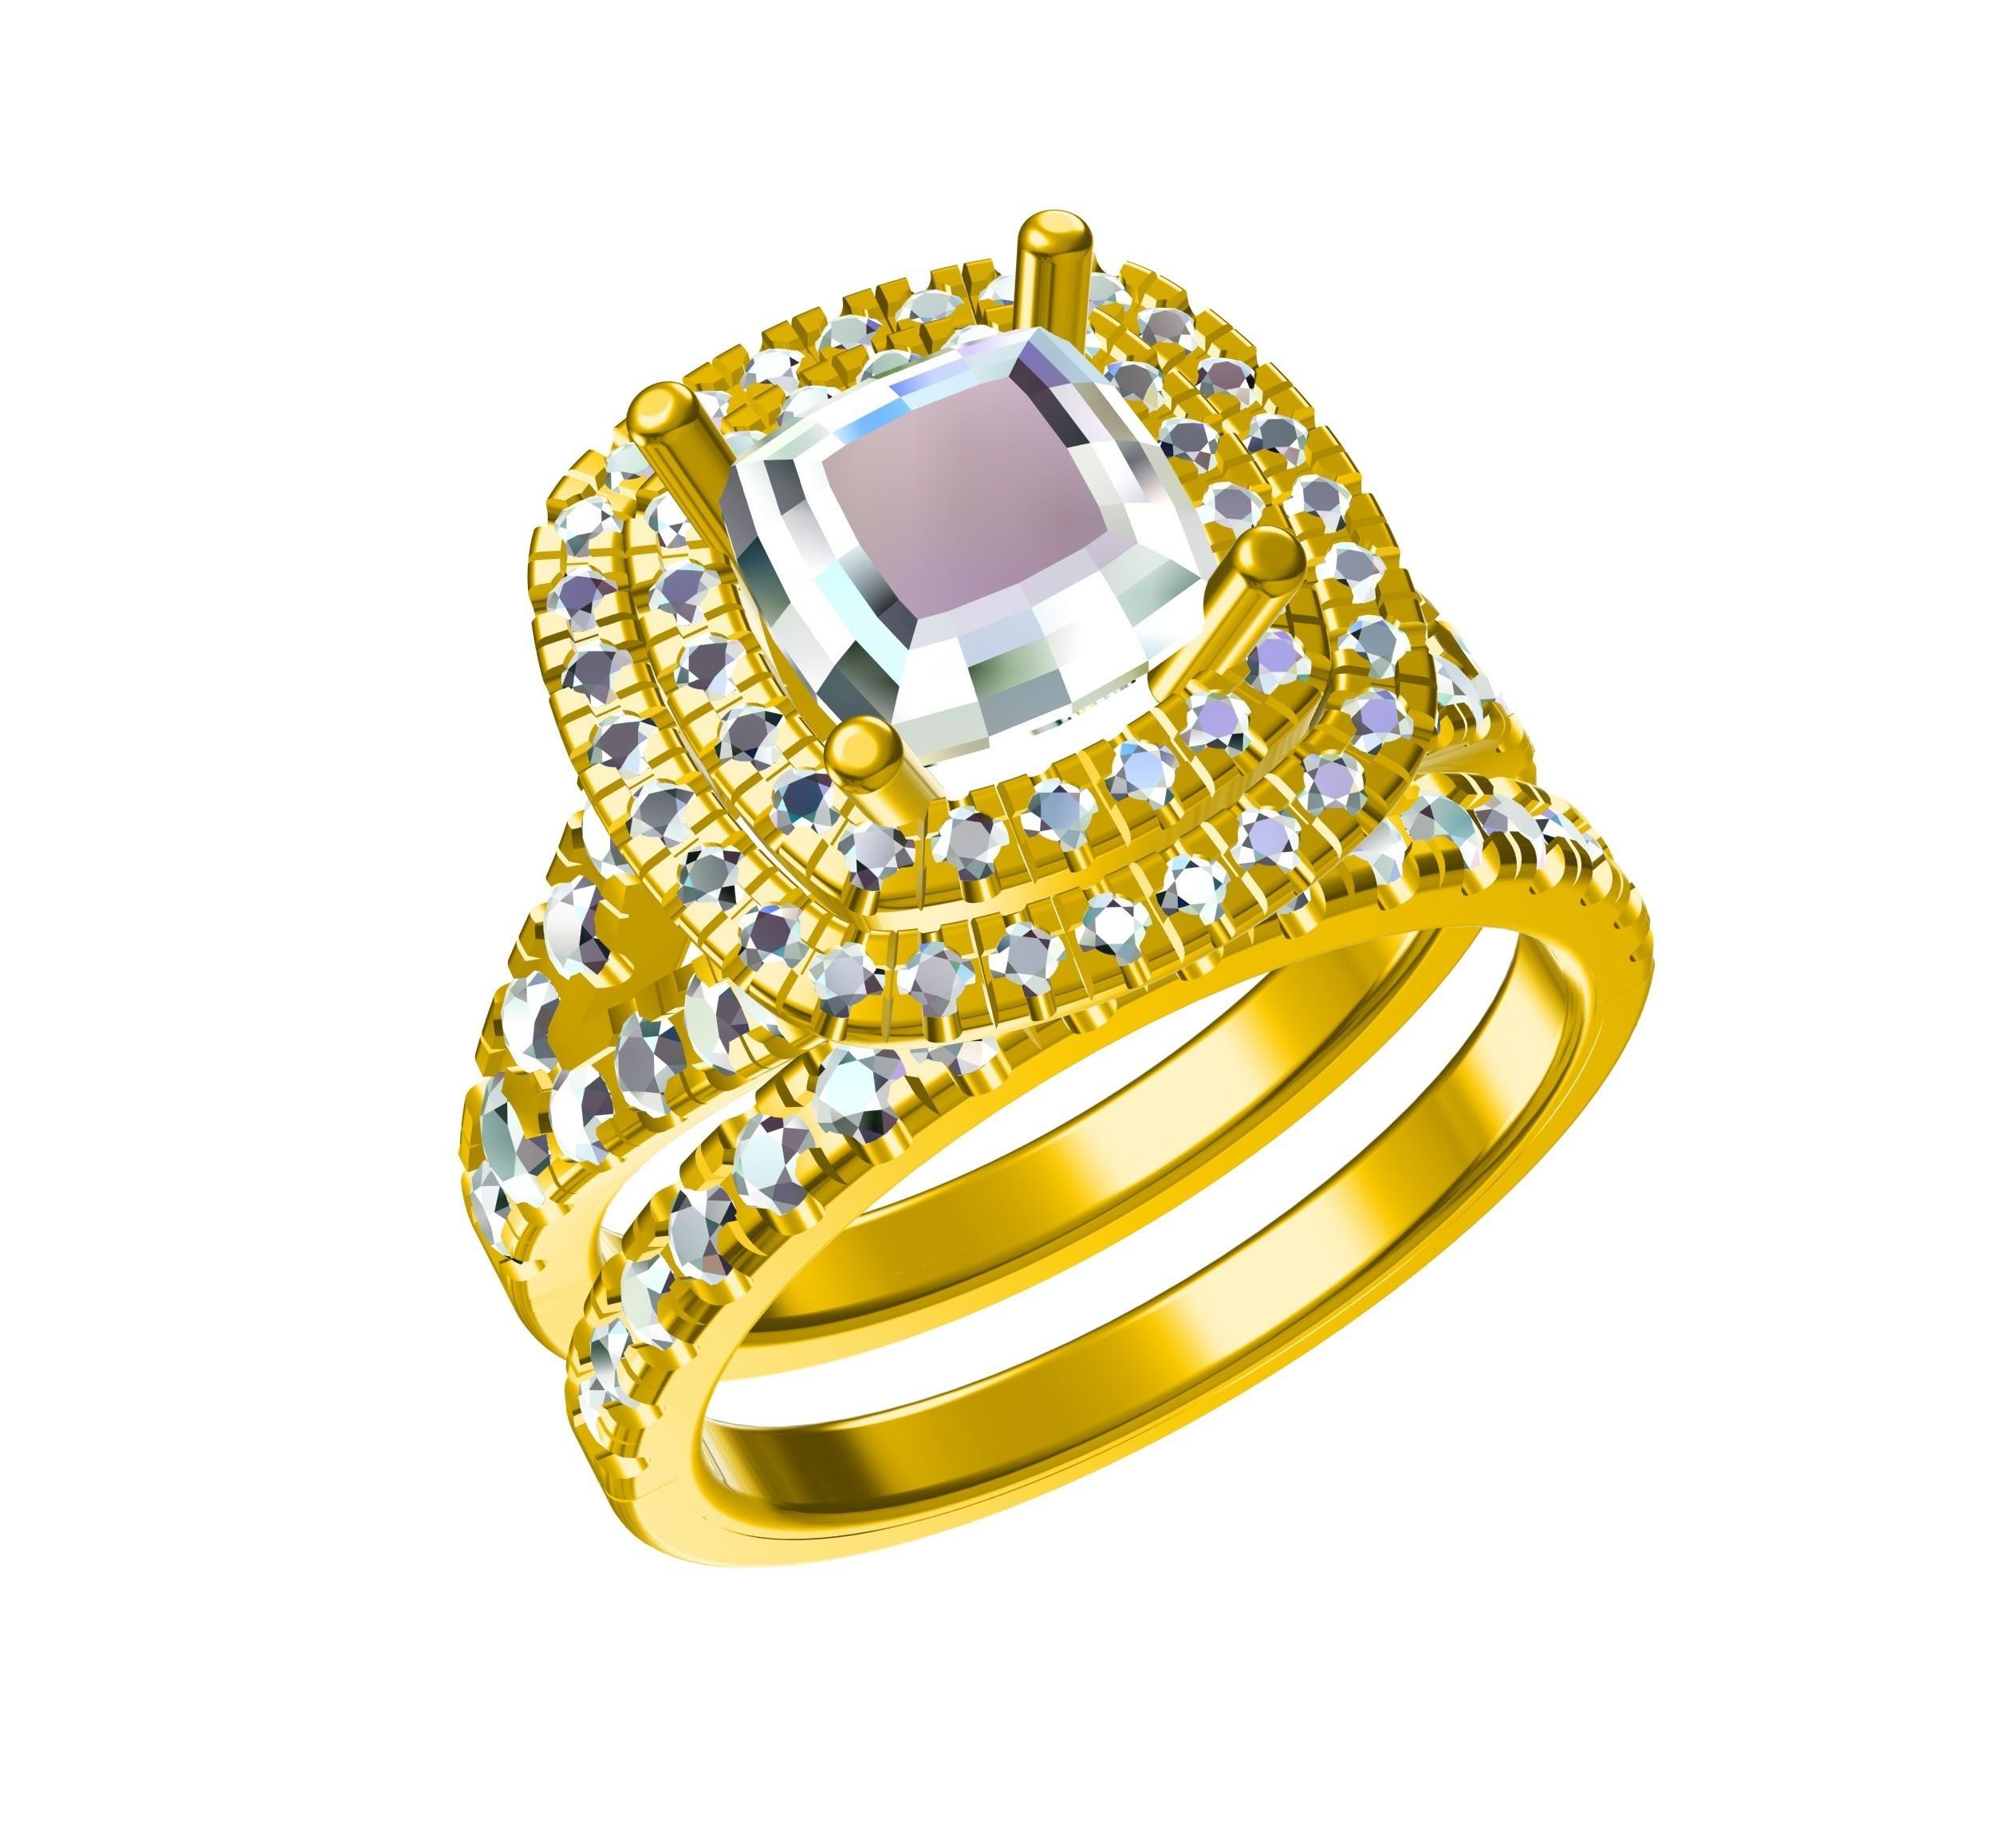 RG27326 (2).jpg Download STL file Exclusive Jewelry 3D CAD Model Of Bridal Ring Set • 3D printable template, VR3D